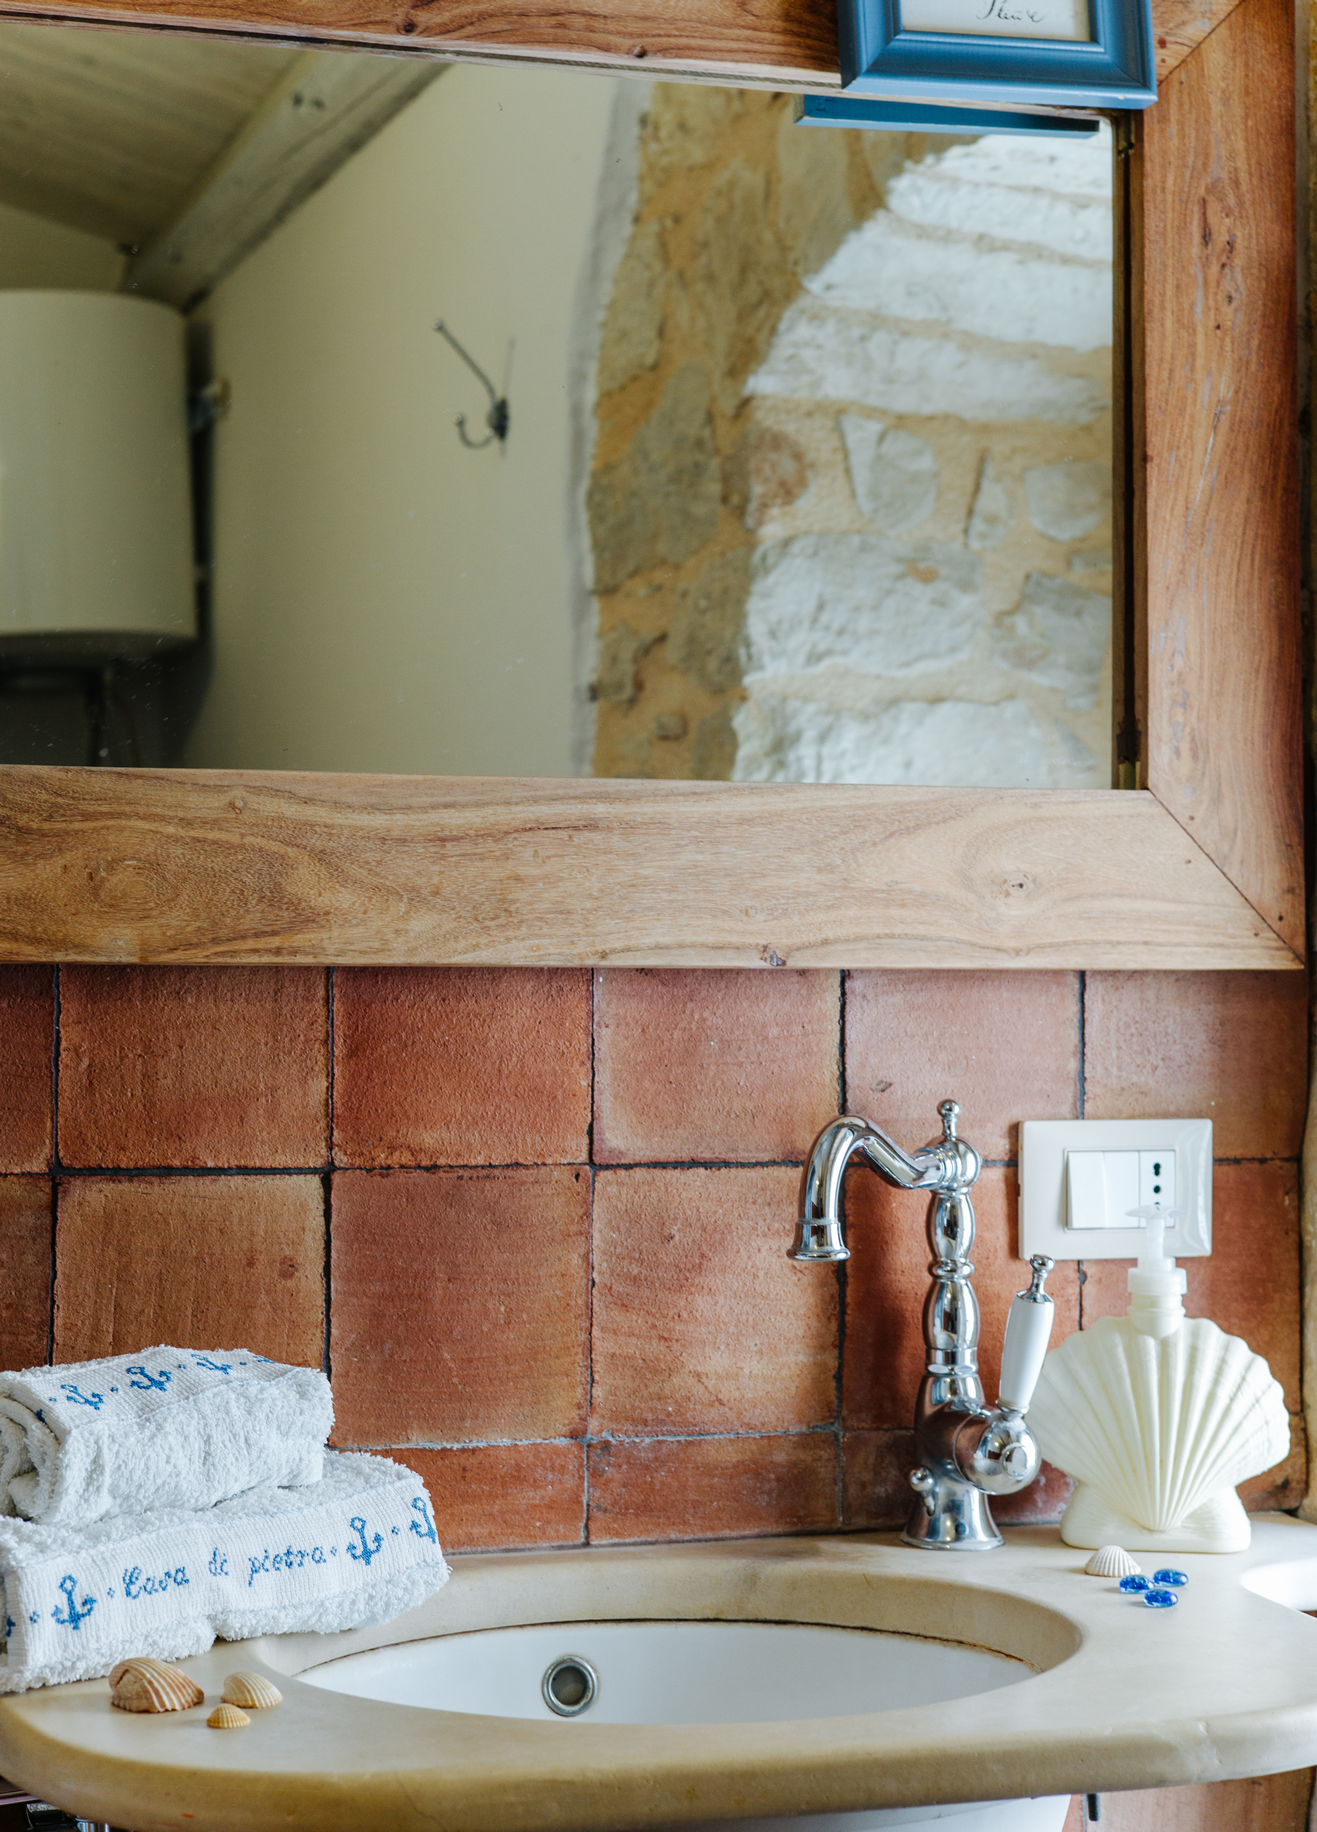 14sampieri-casa-vacanze-sicilia-appartamento-sicily-holiday-apartment-casa-di-pietra-italia-italy.jpg